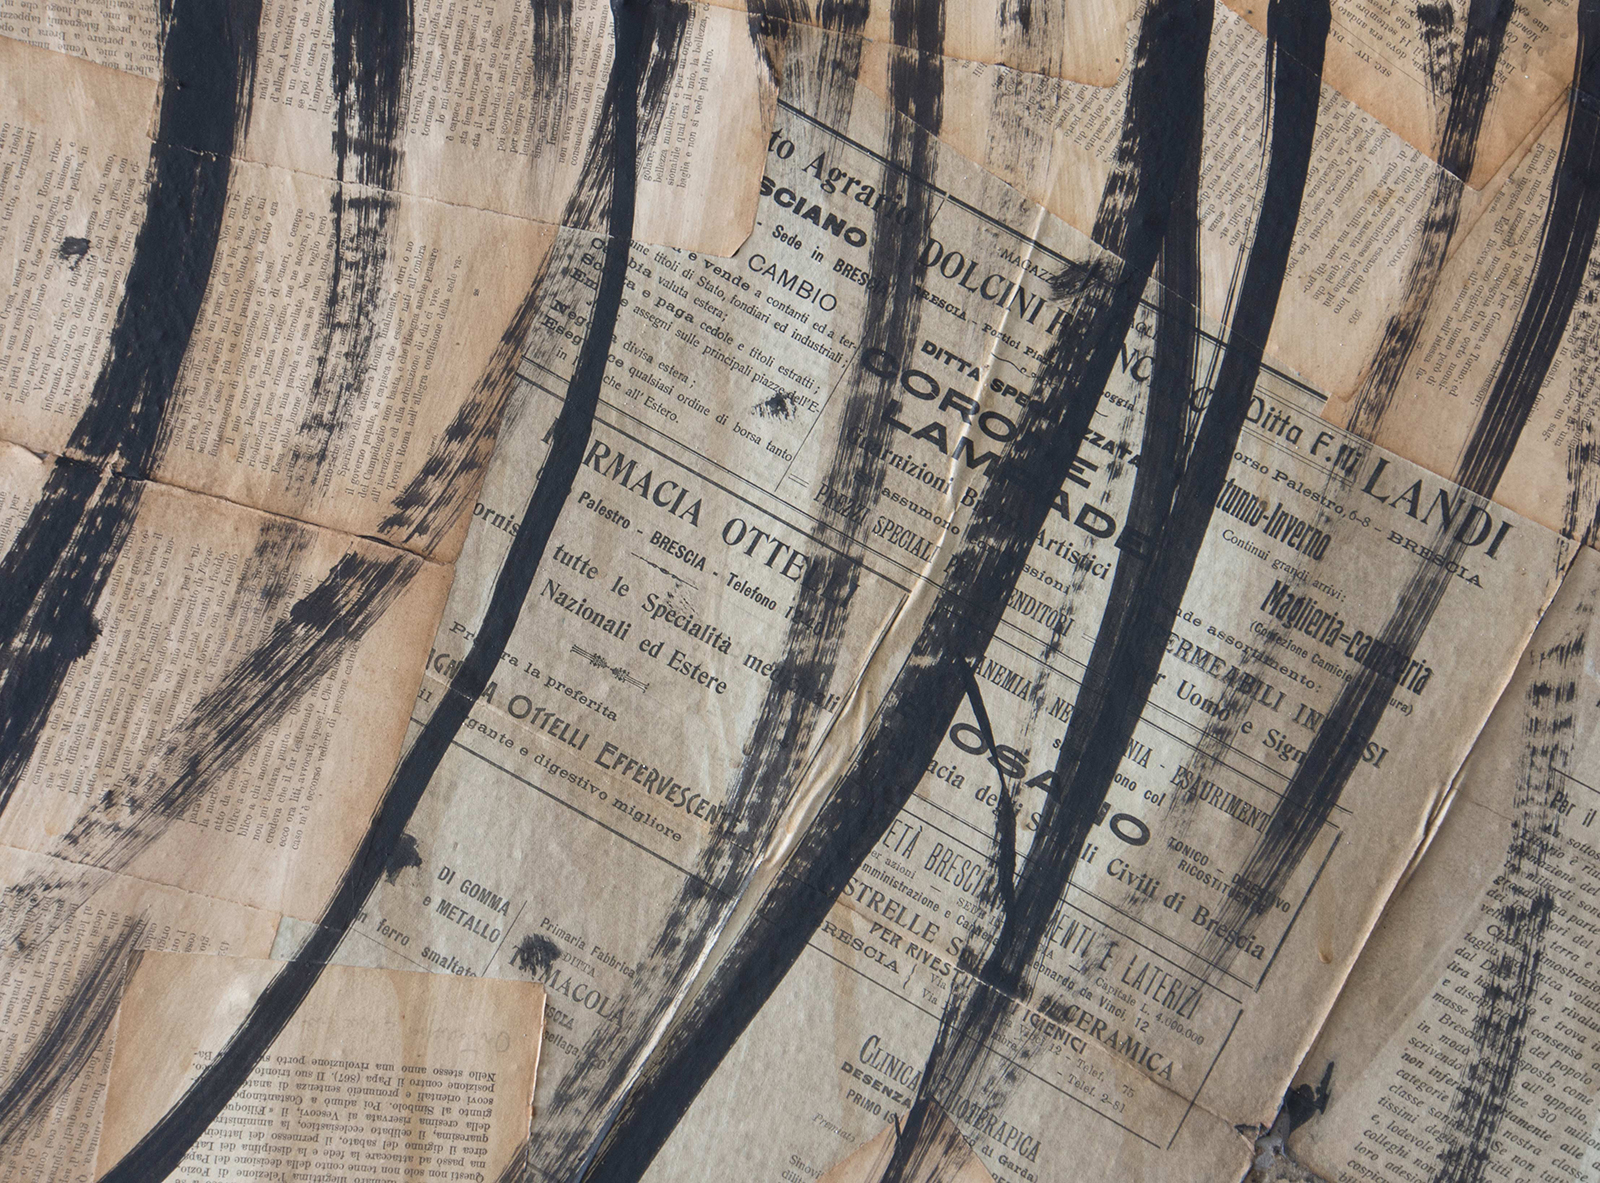 nemos-dissensocognitivo-natura-morta-mural-05